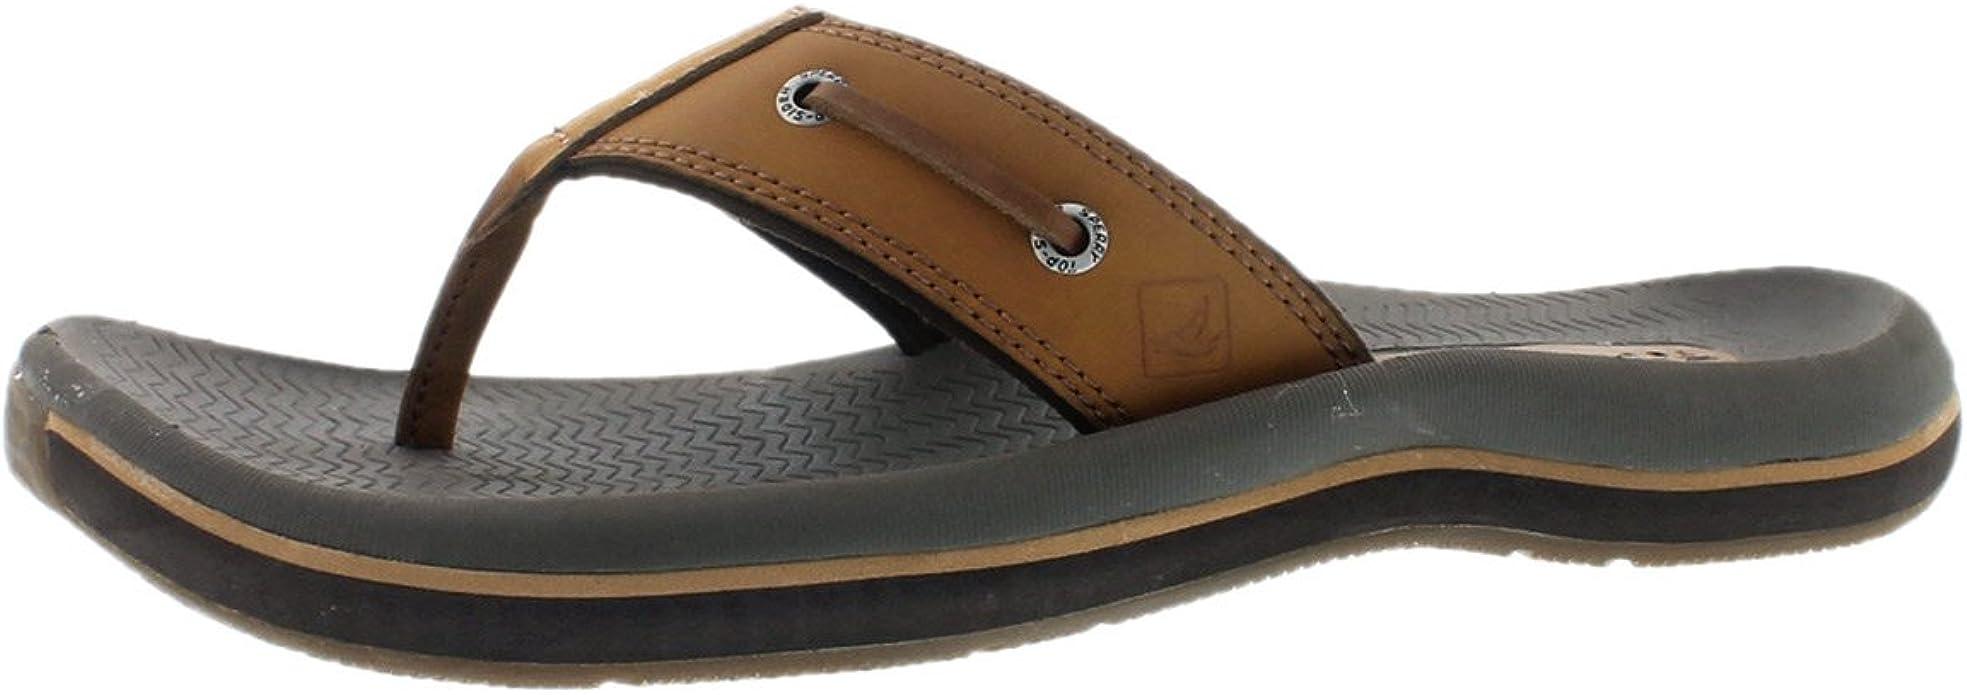 Santa Cruz Thong Sandal: Amazon